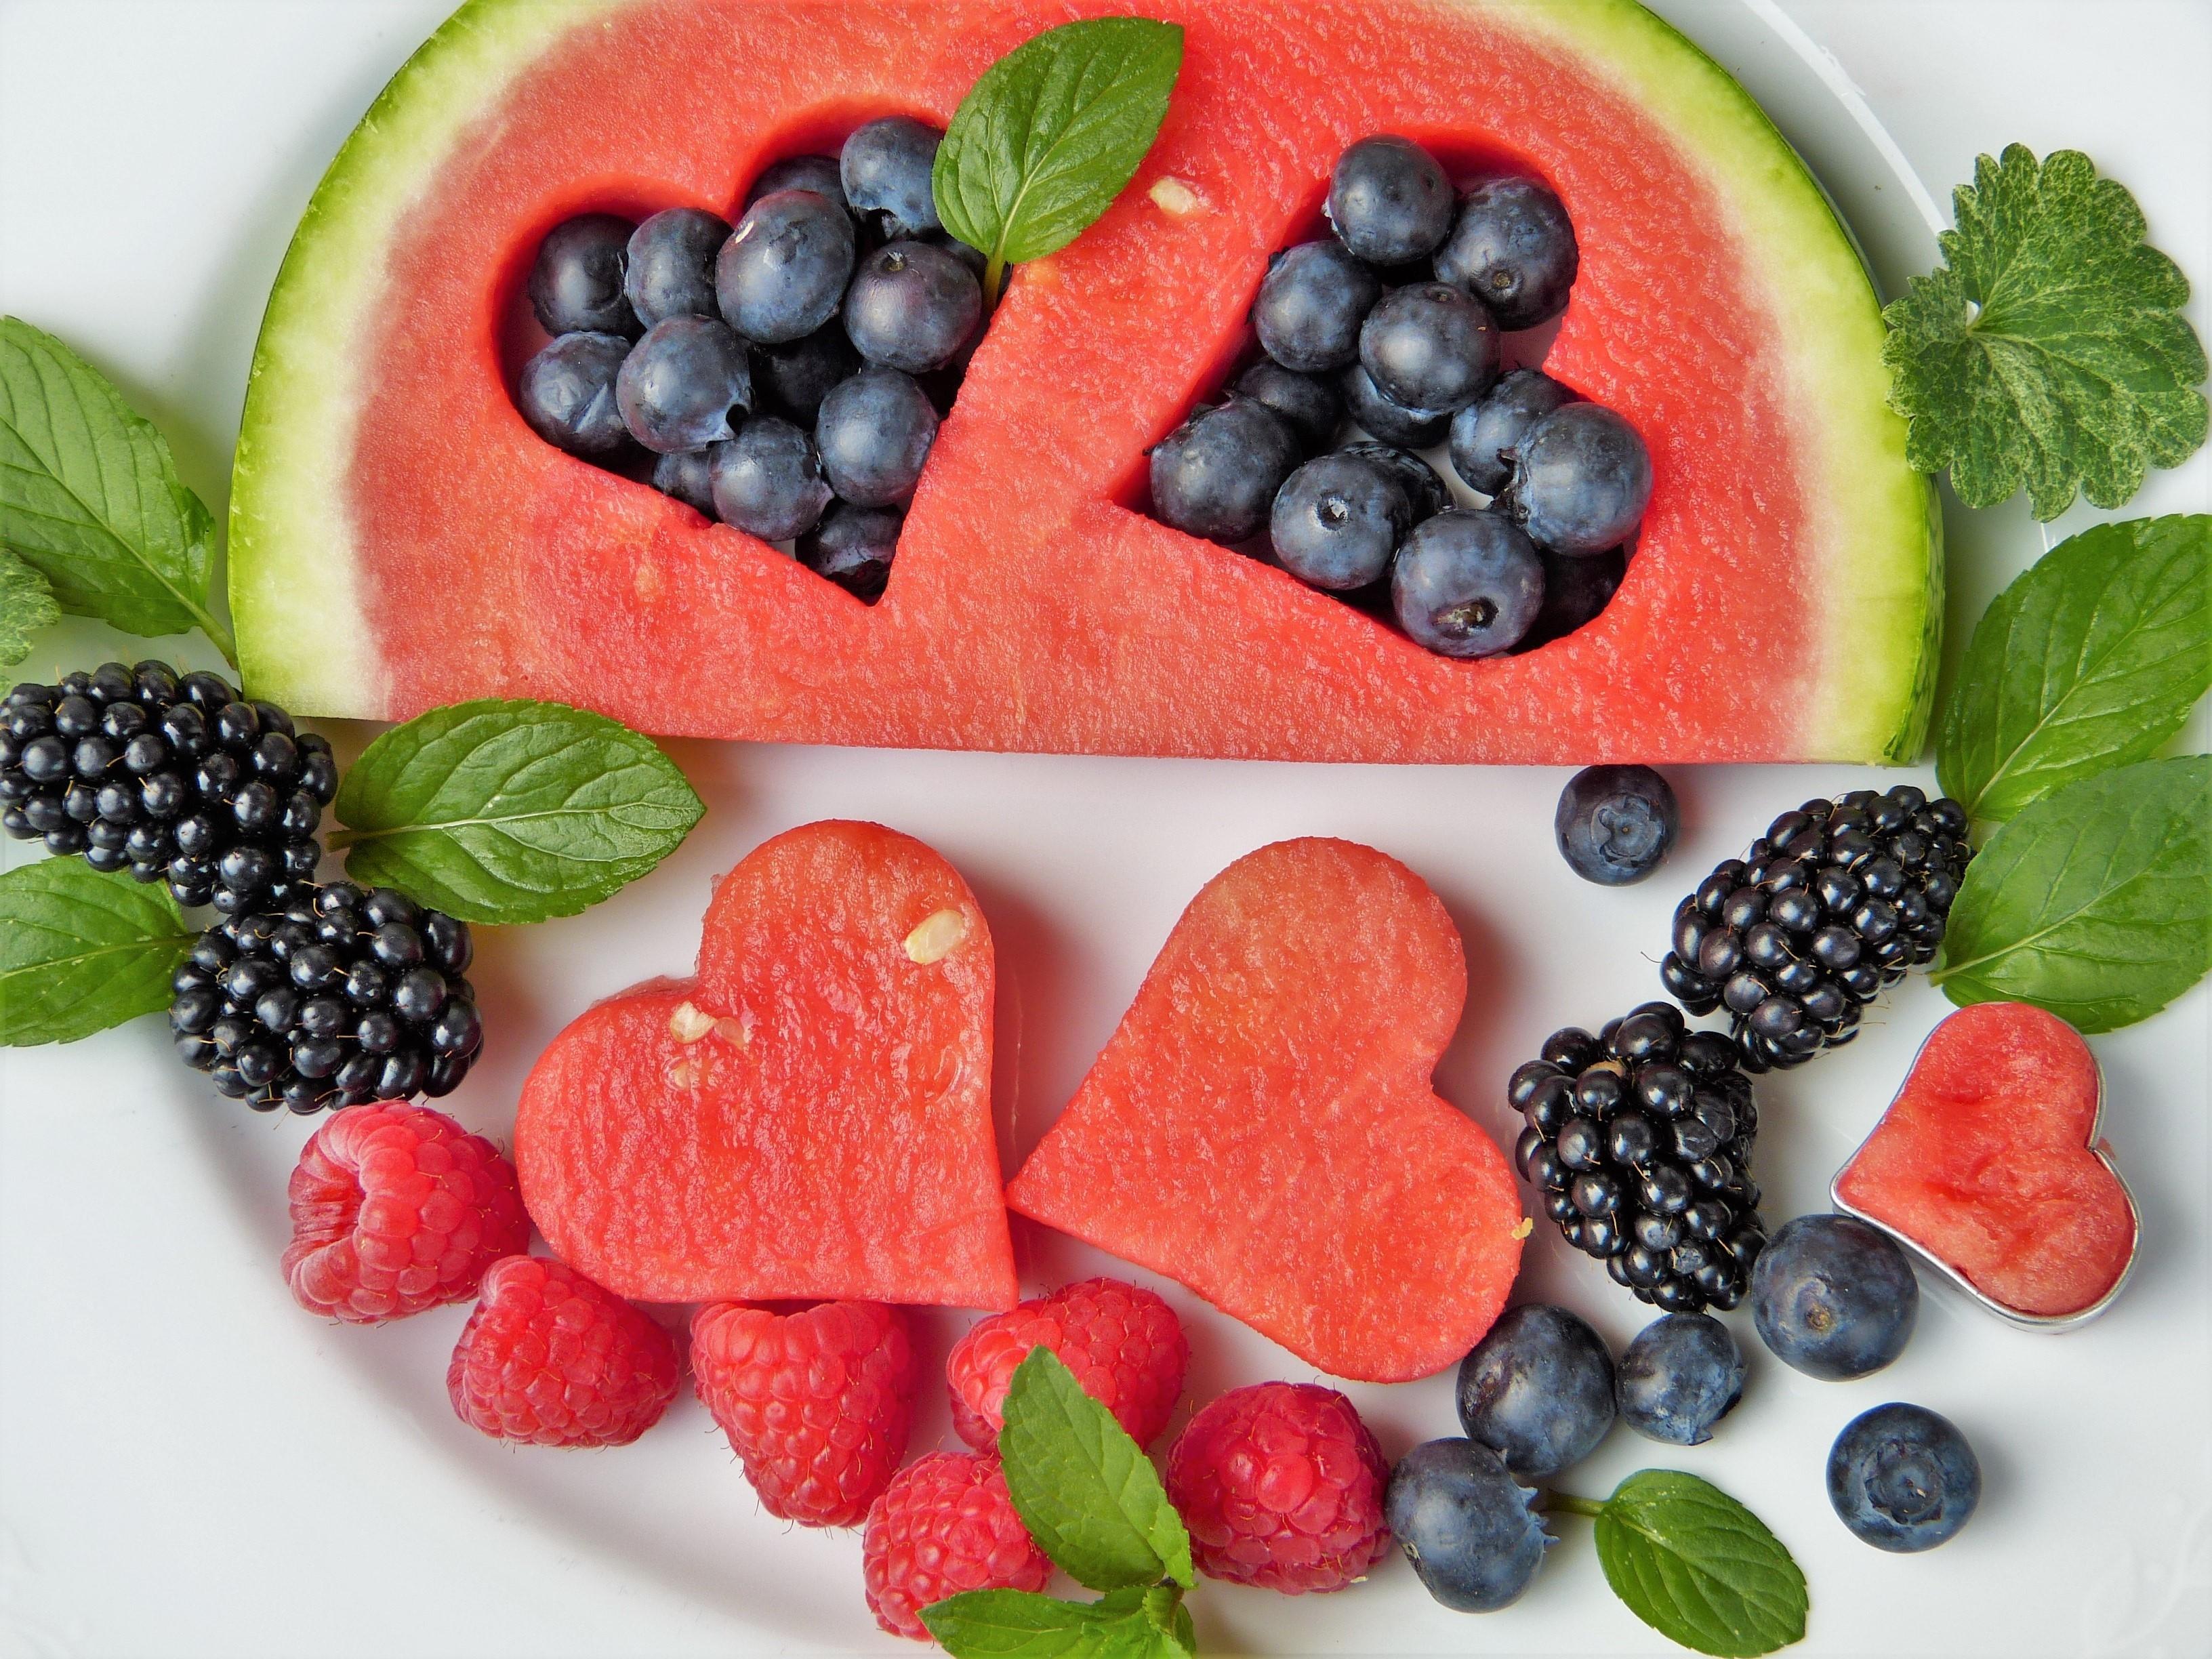 fruit-2367029